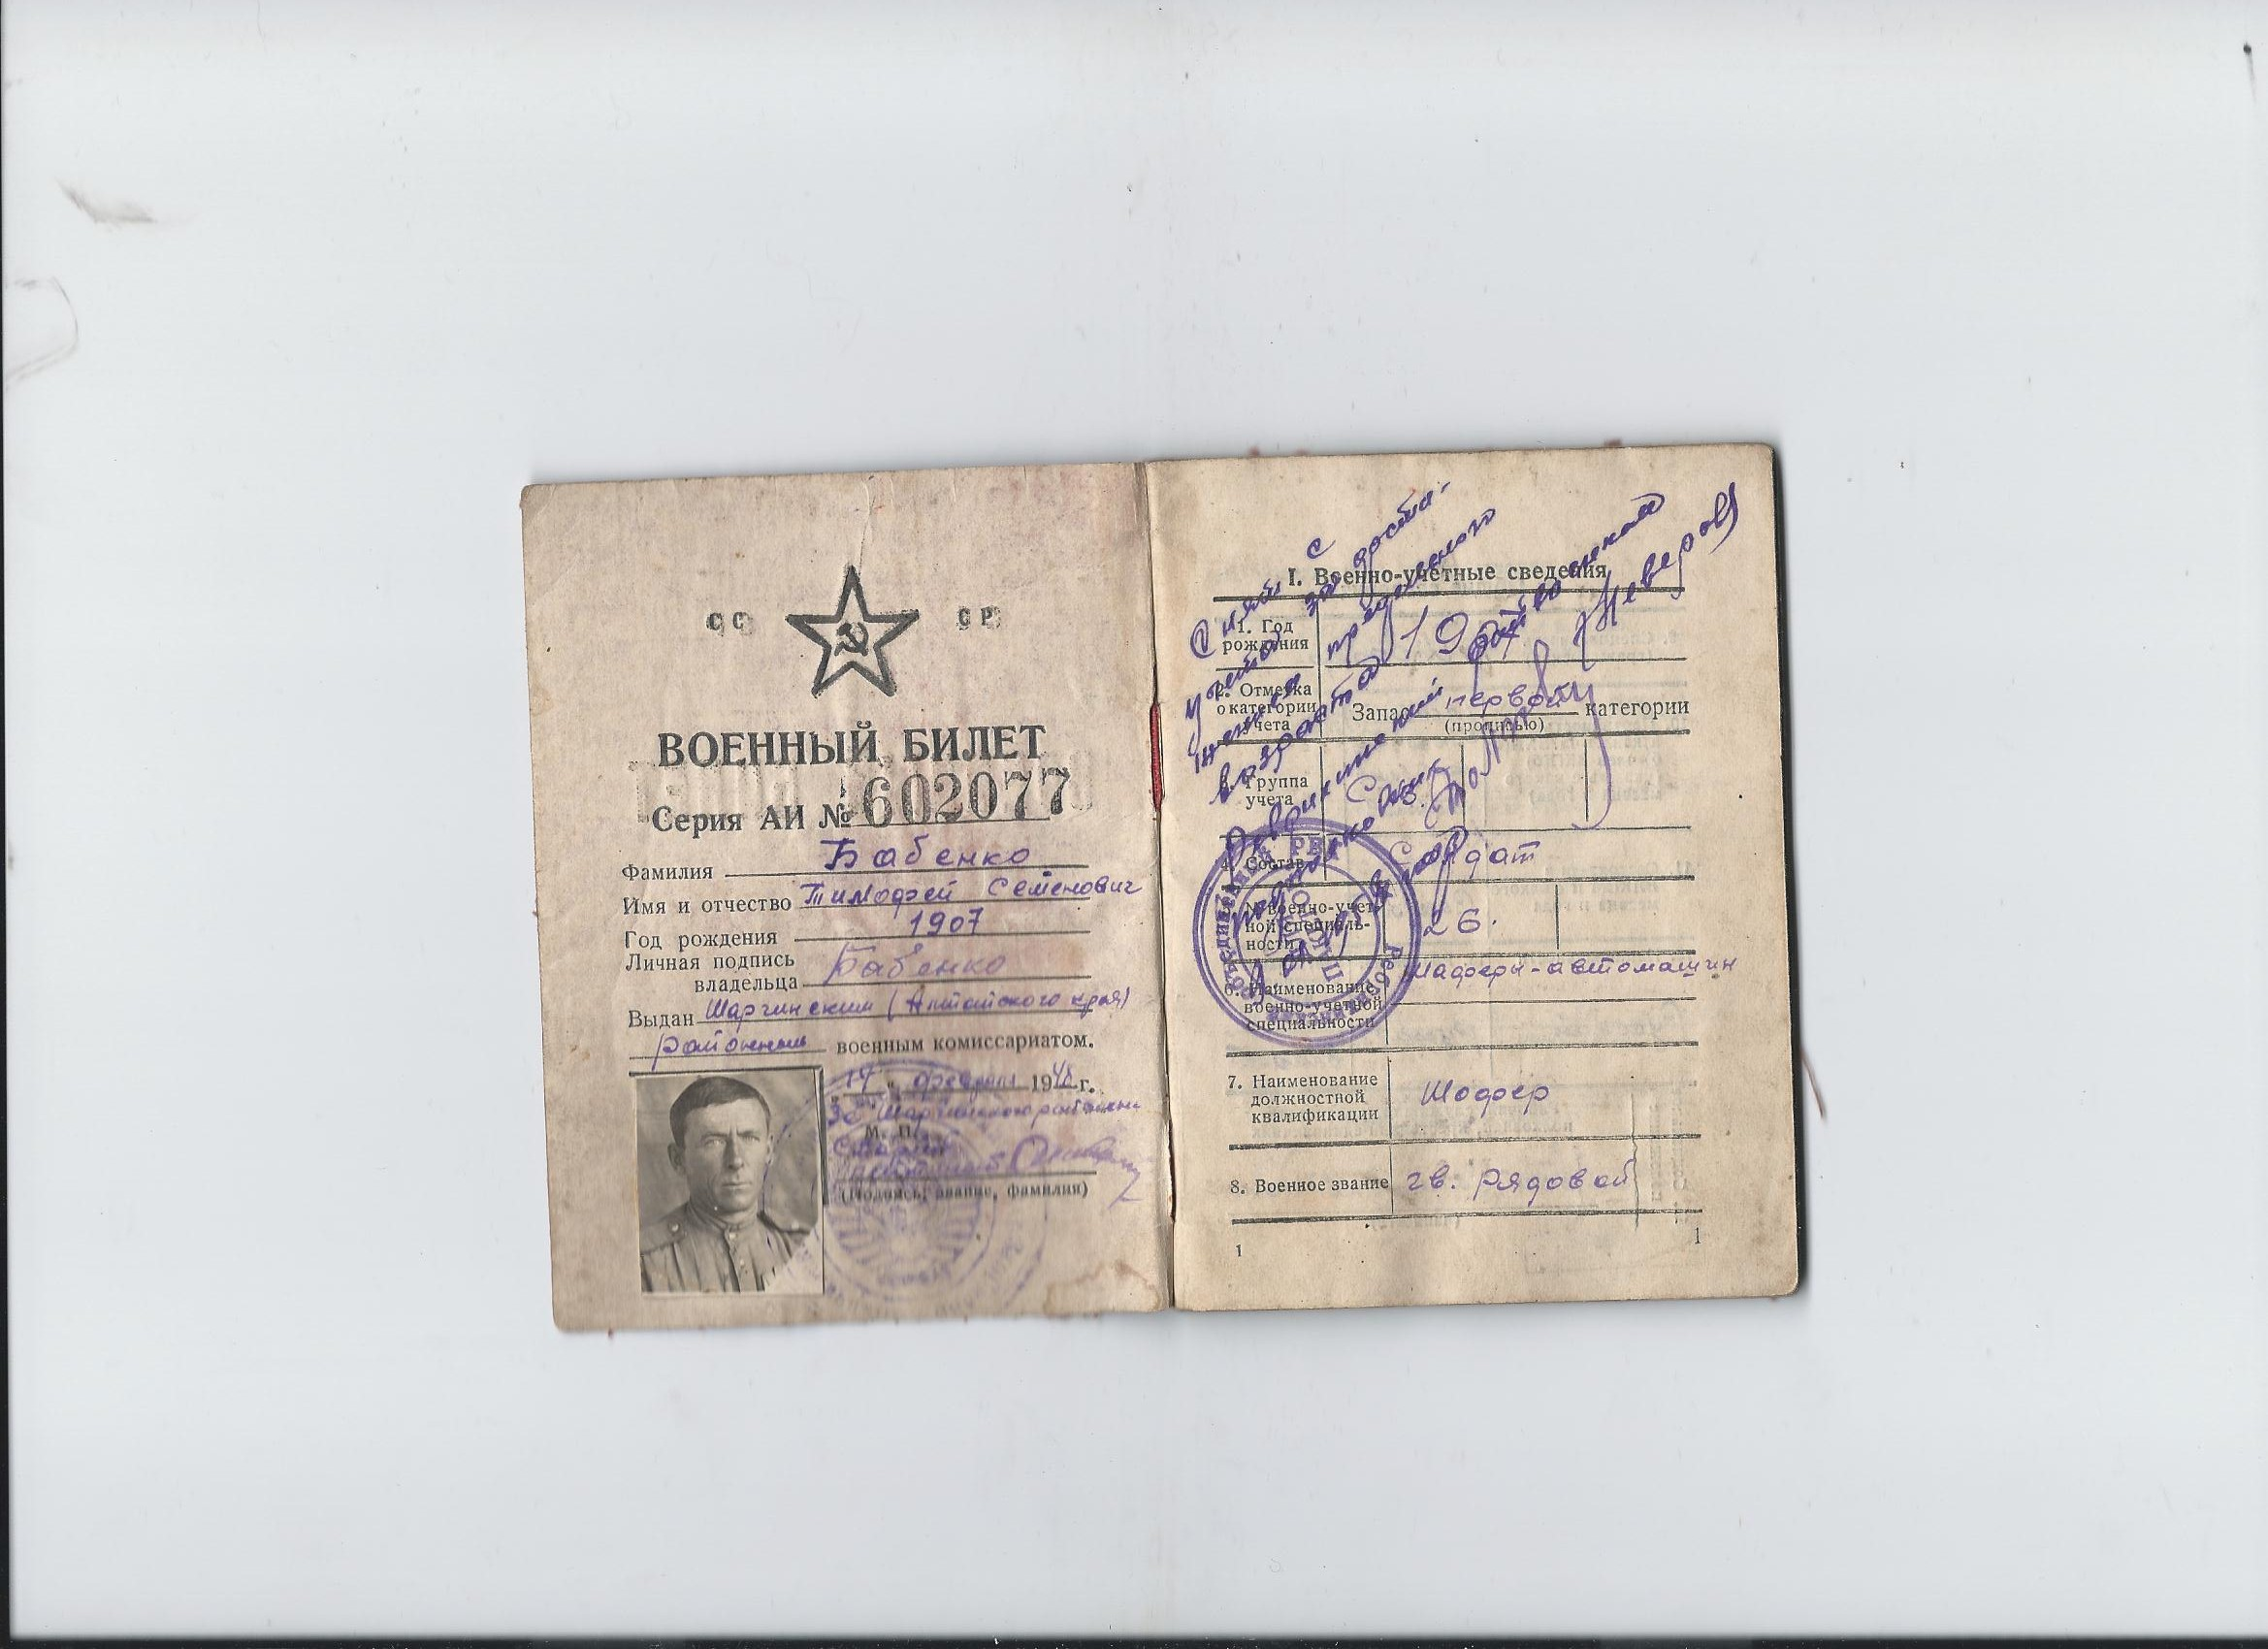 G:\НПК нач. школа Материалы о Бабенко\Военный билет\военный билет.jpg